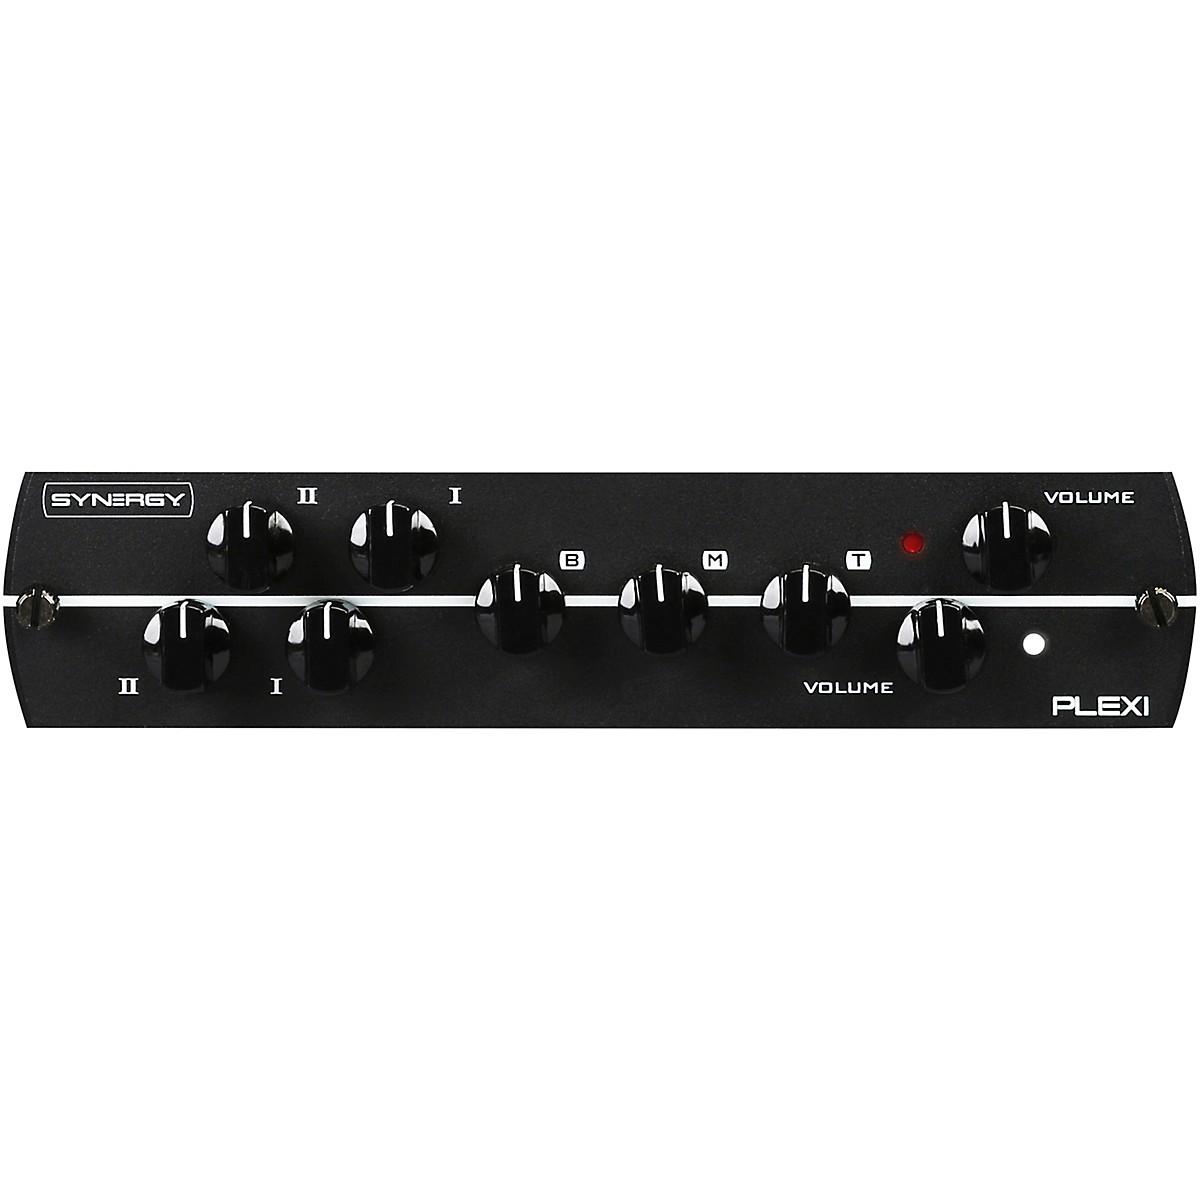 Synergy Plexi 2-Channel Tube Preamp Module